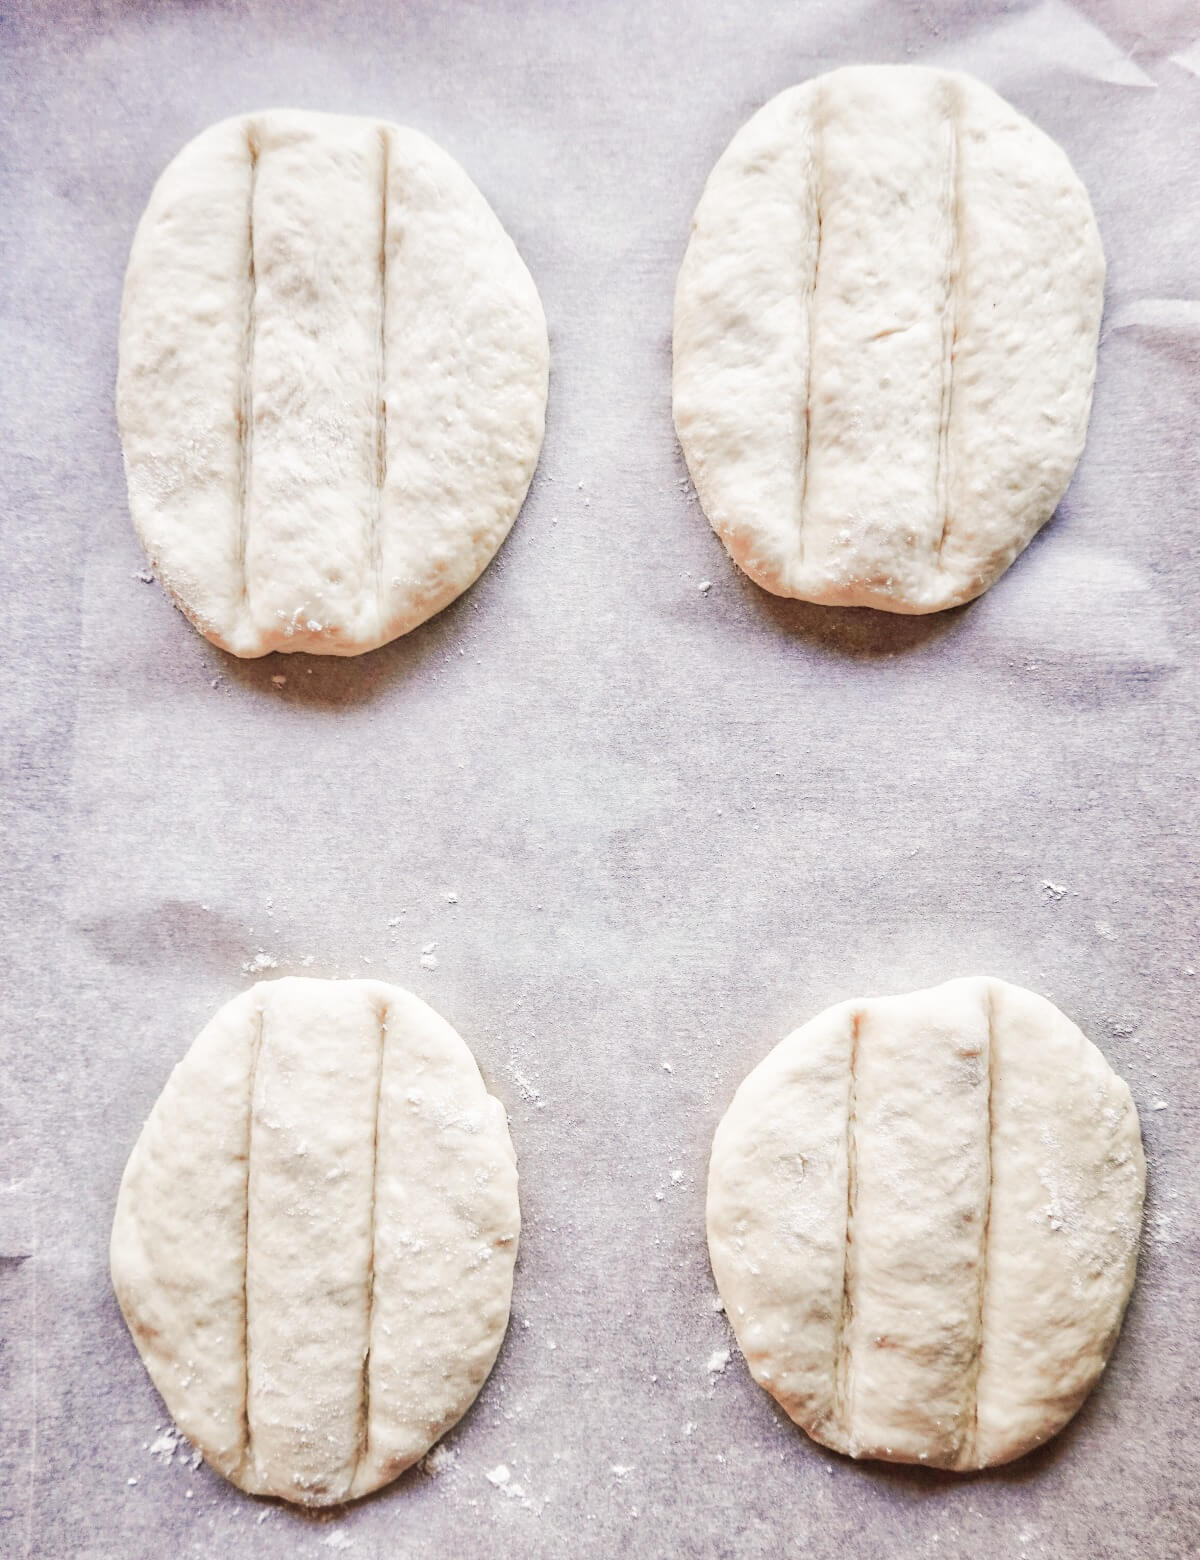 Telera rolls shaped before baking